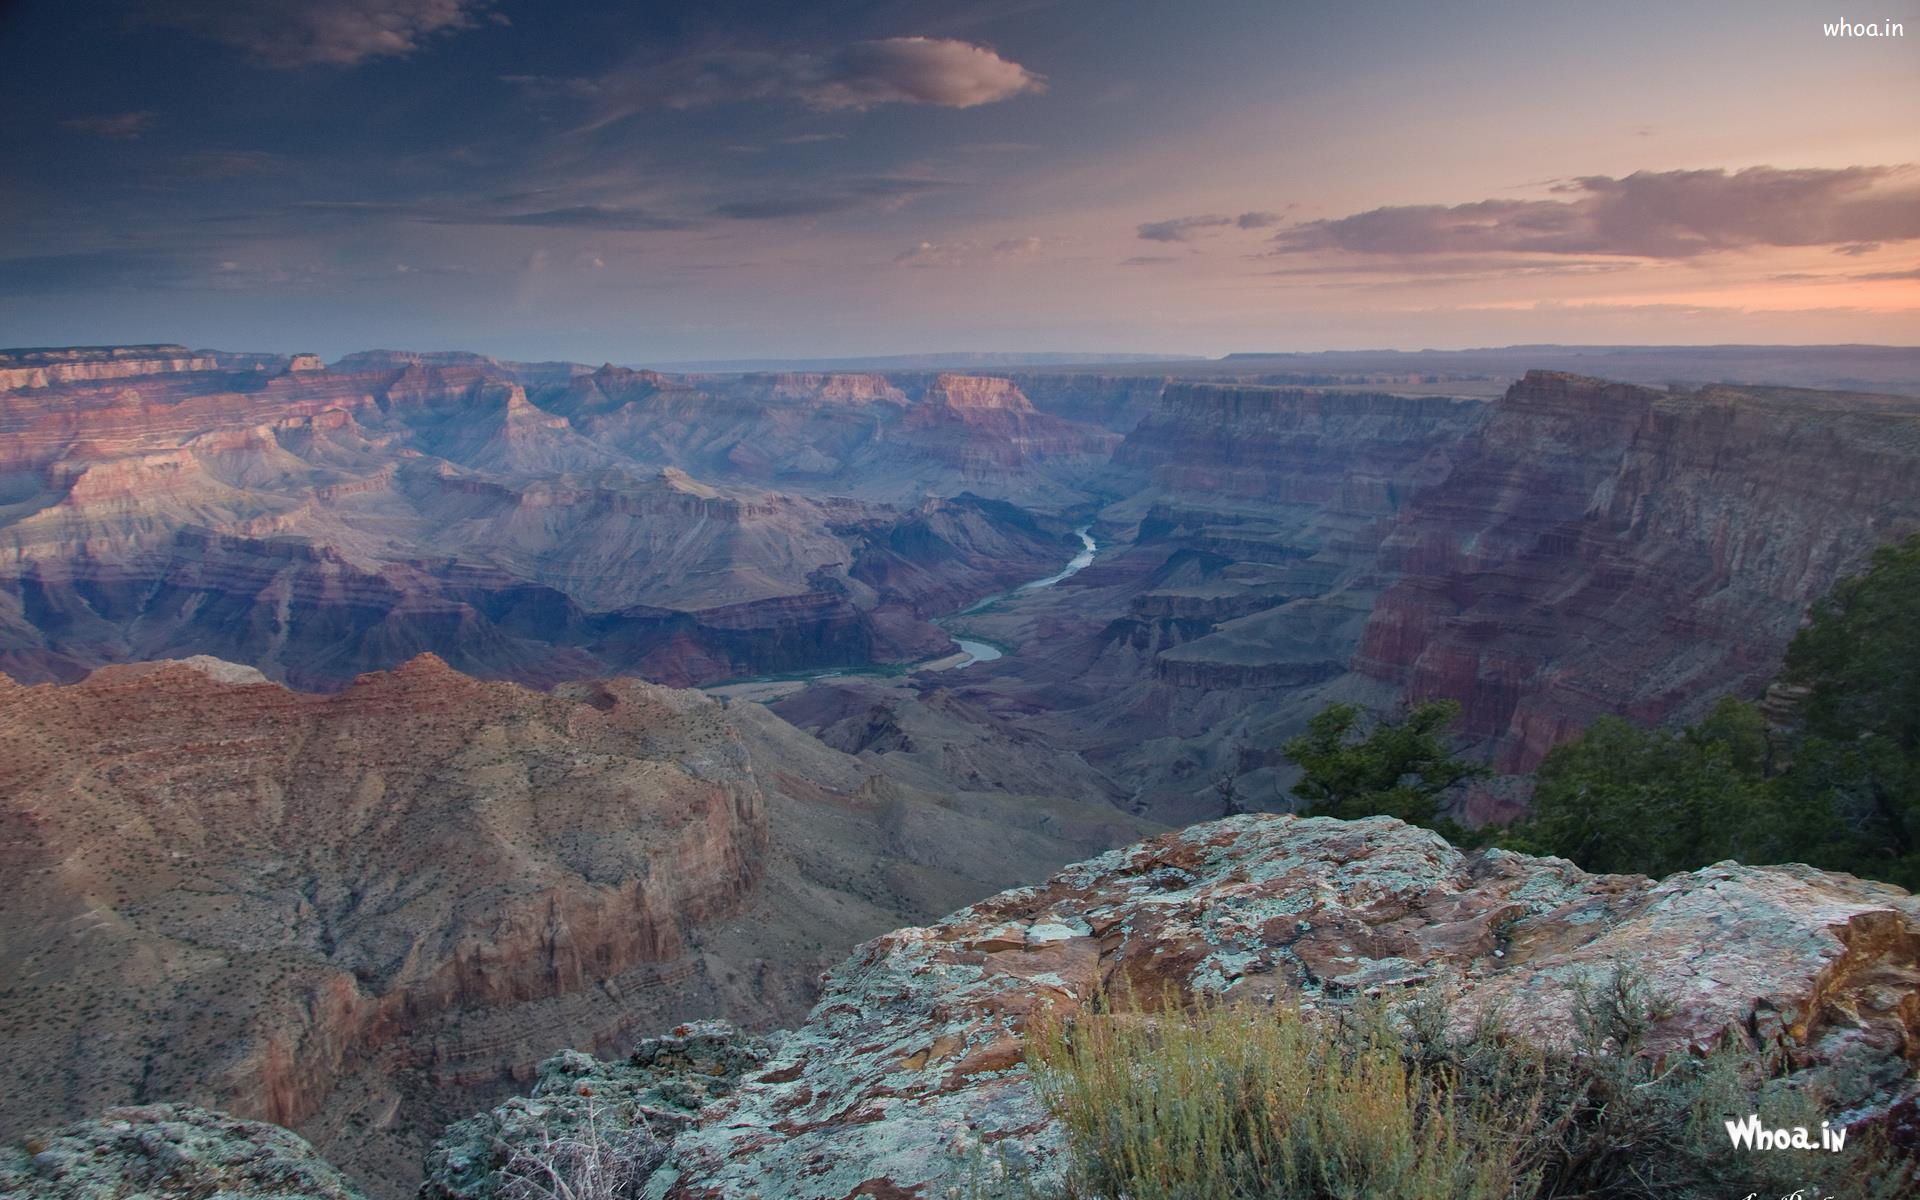 natural mountain view hd photoshoot desktop wallpaper